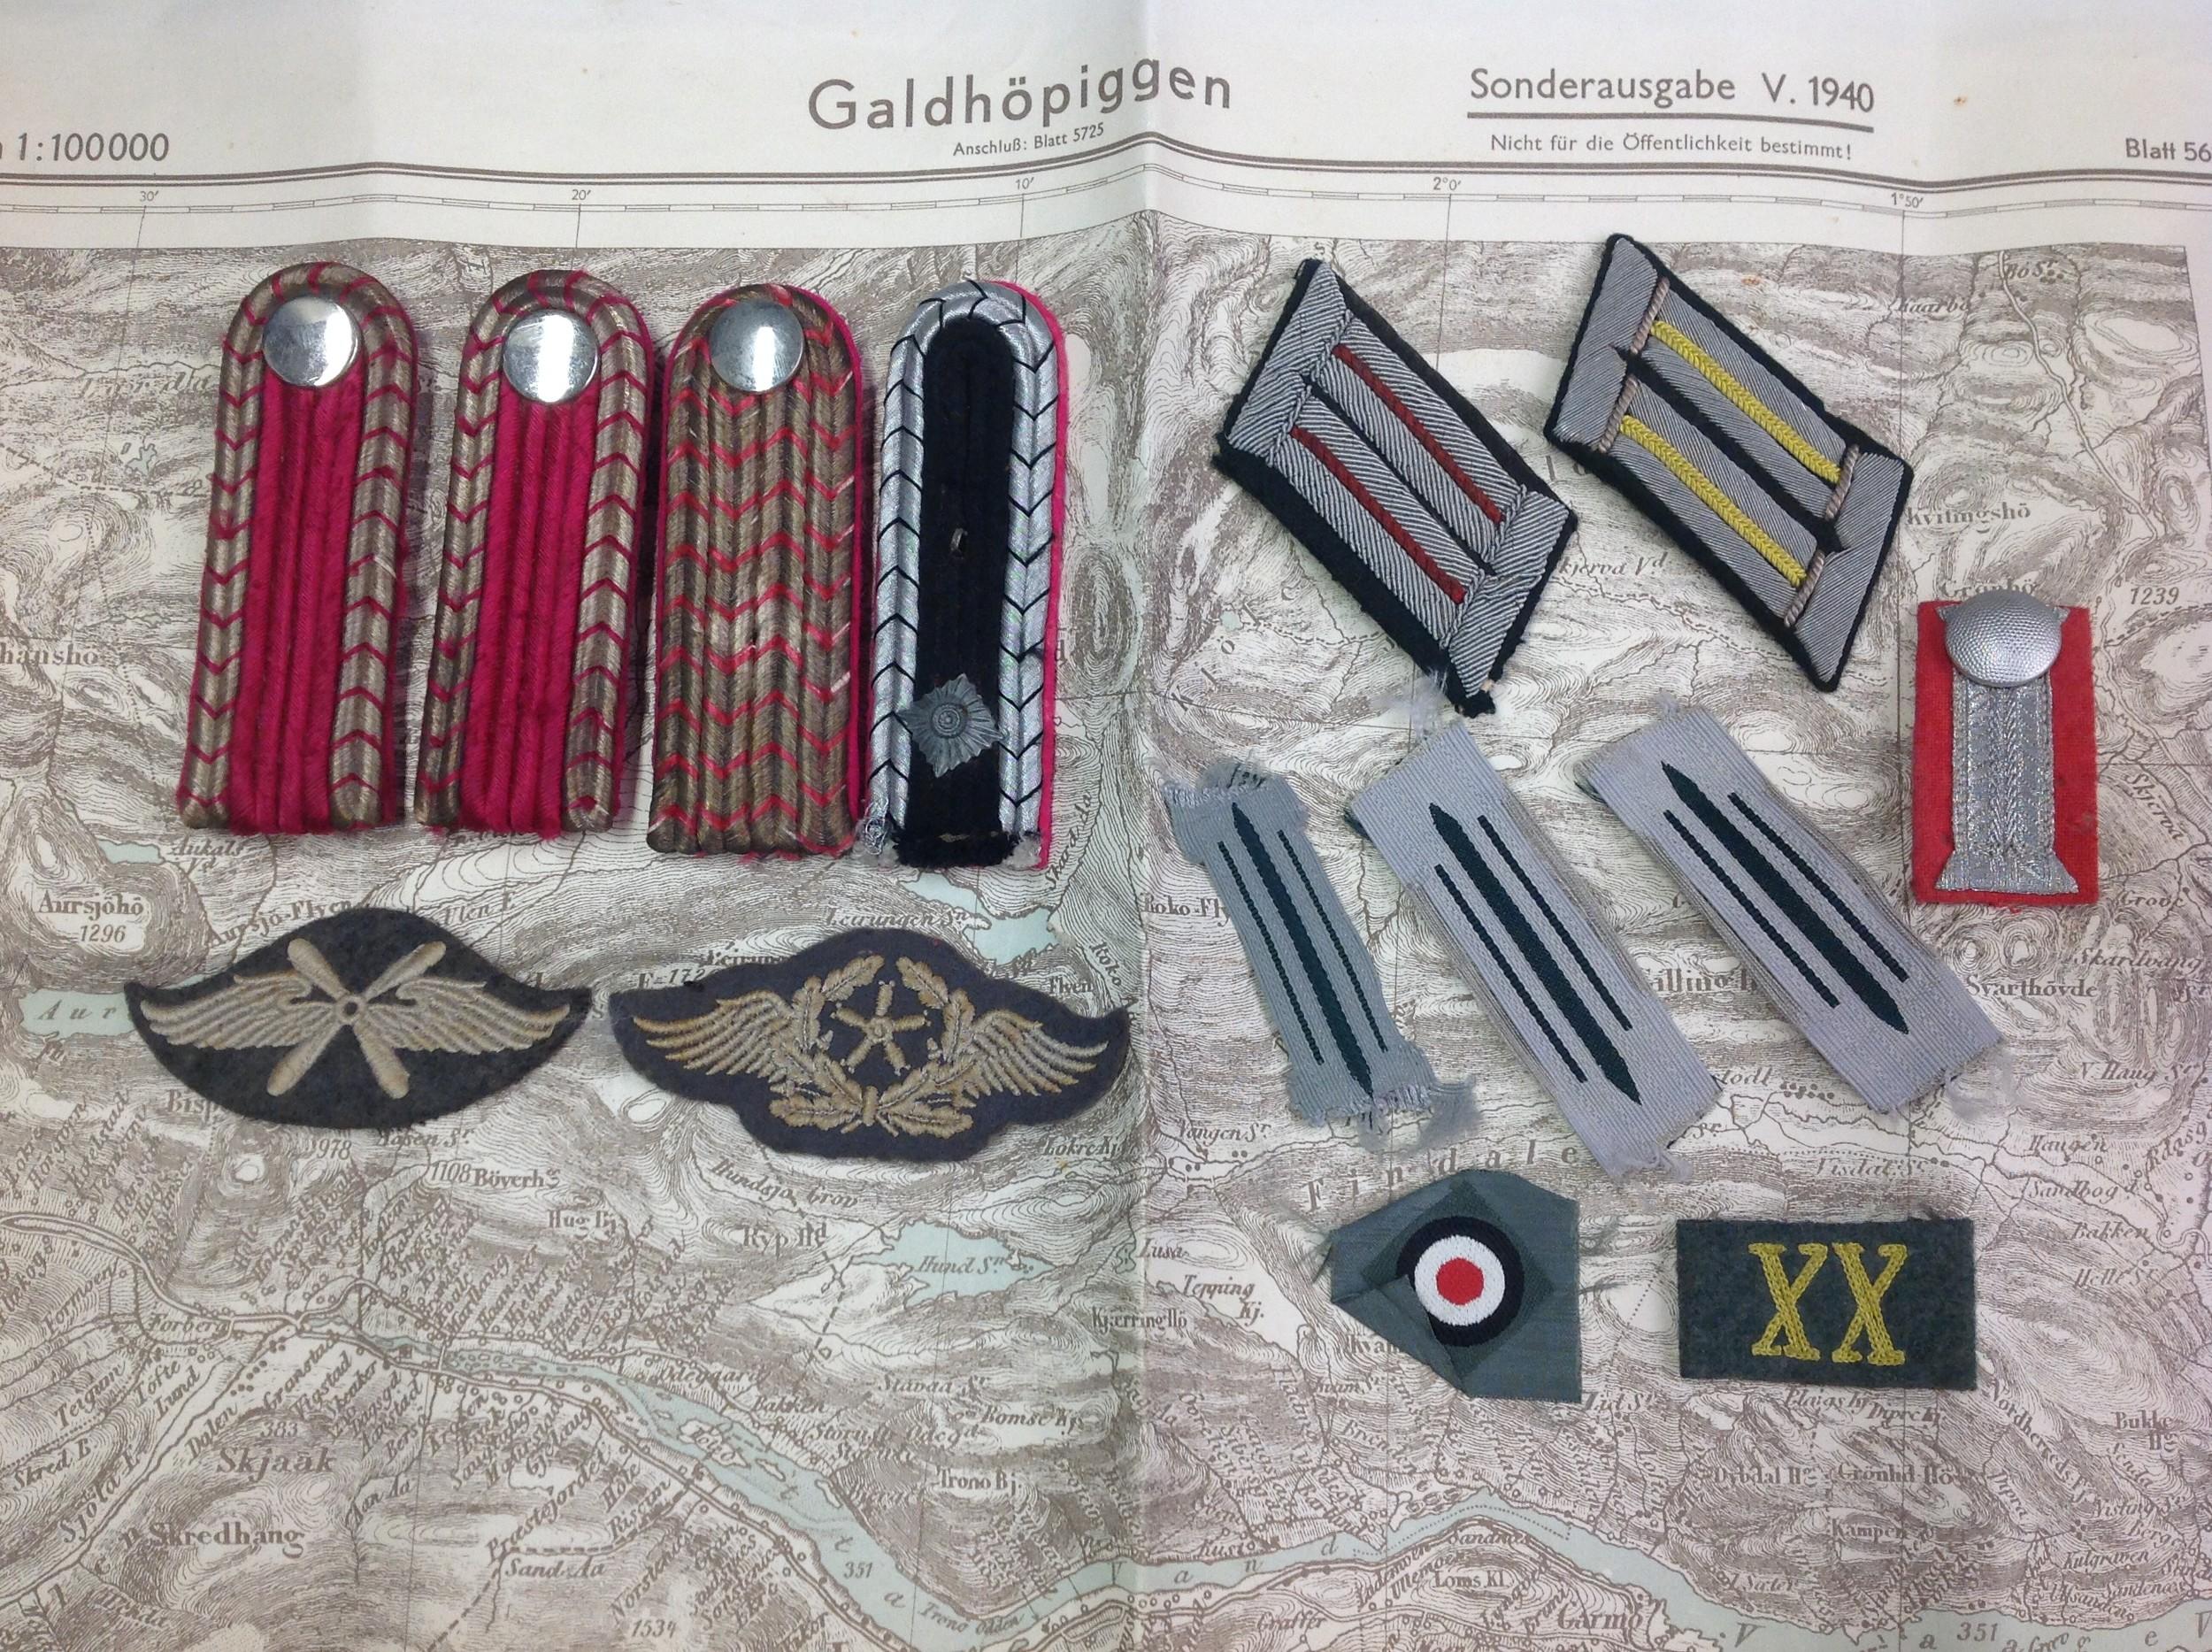 WW2 Third Reich mixed Heer, Luftwaffe trade badgesand Fire Police insignia to include collar Litzen,